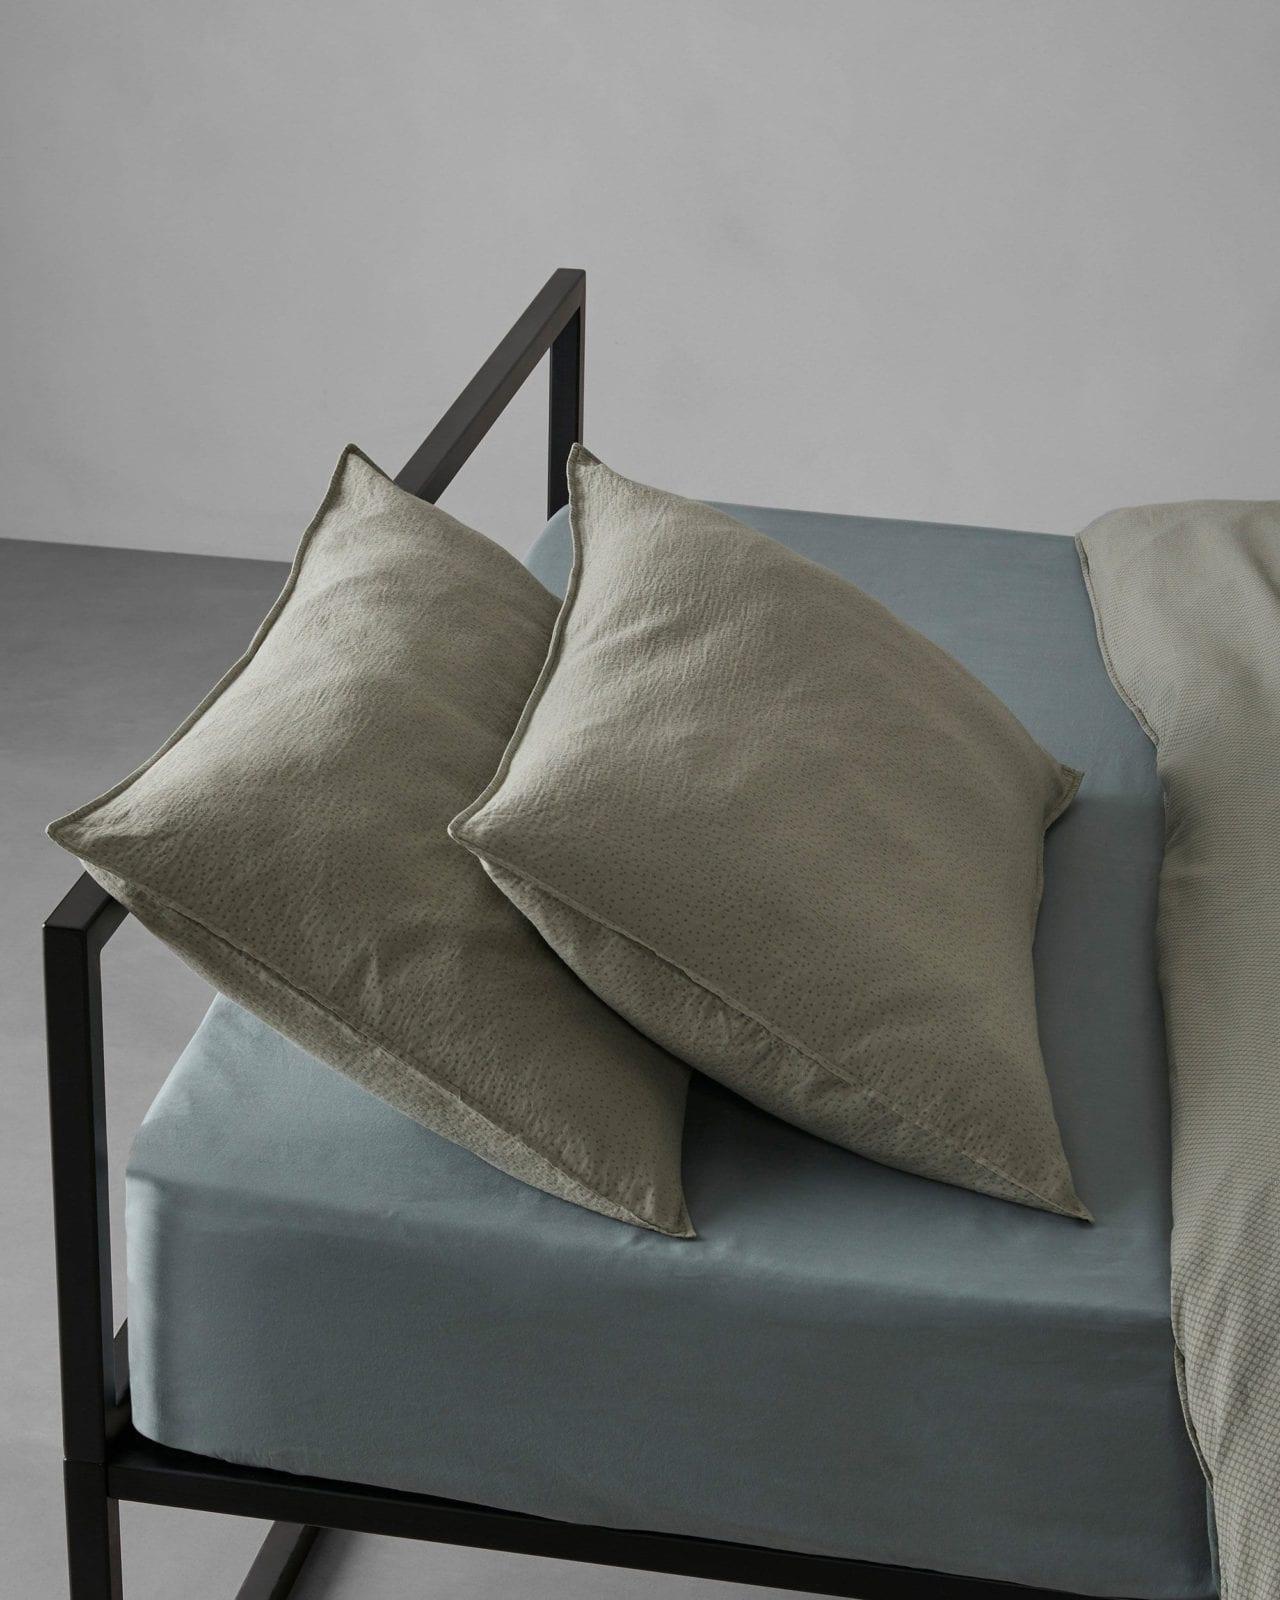 Society Limonta Pillow Case - Danke - Camo